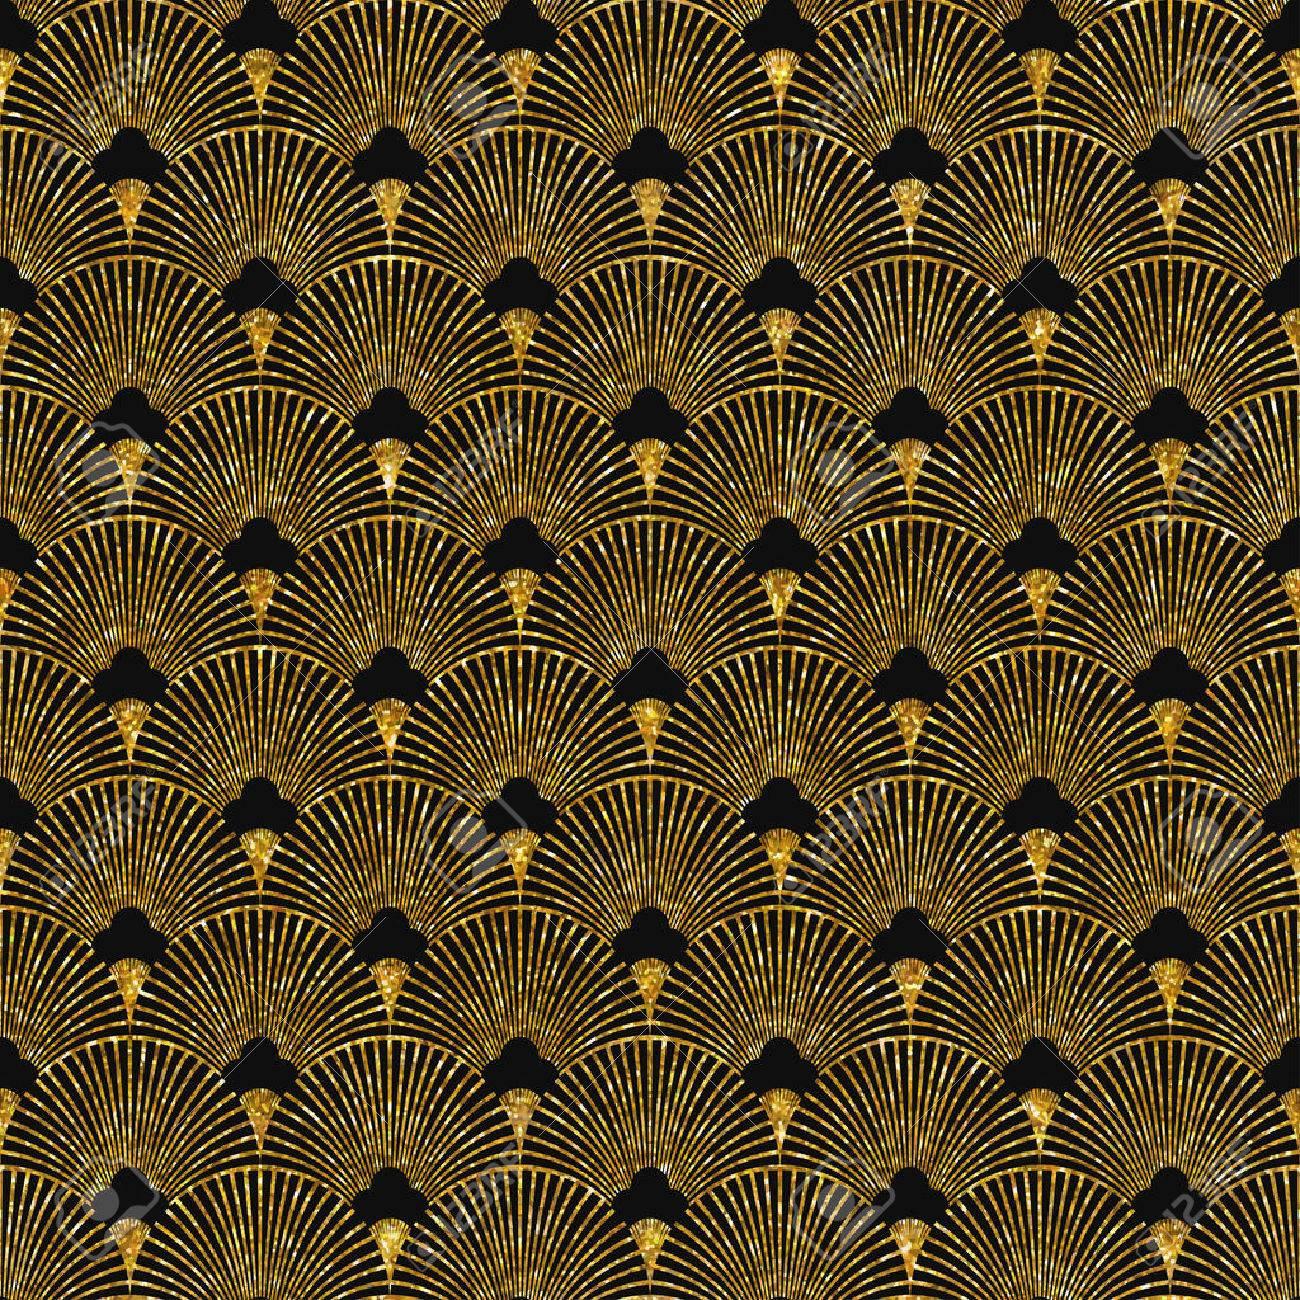 Vector illustration of seamless pattern in art deco style. Golden glittering texture. - 50573129